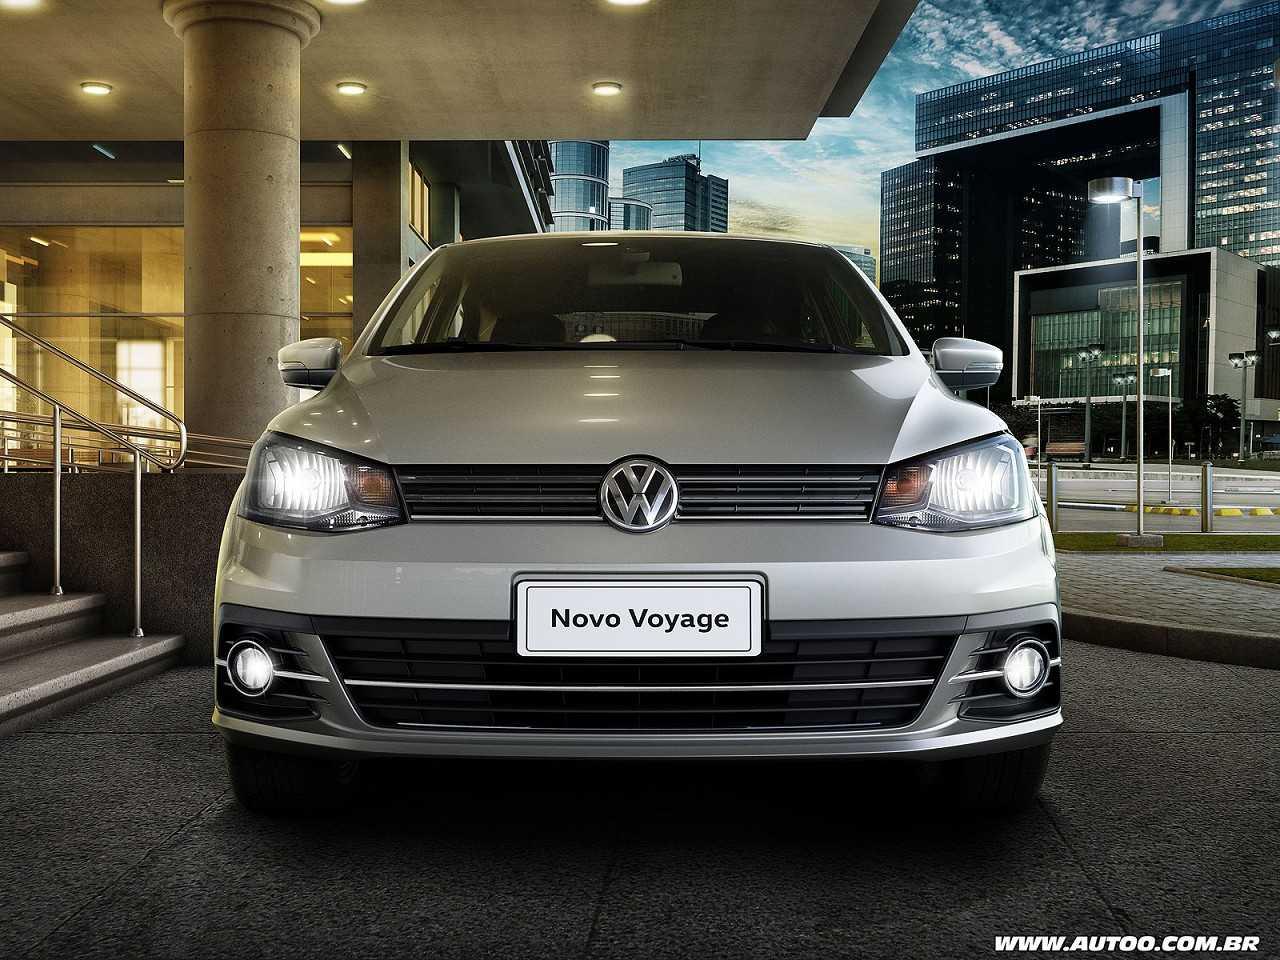 VolkswagenVoyage 2017 - frente